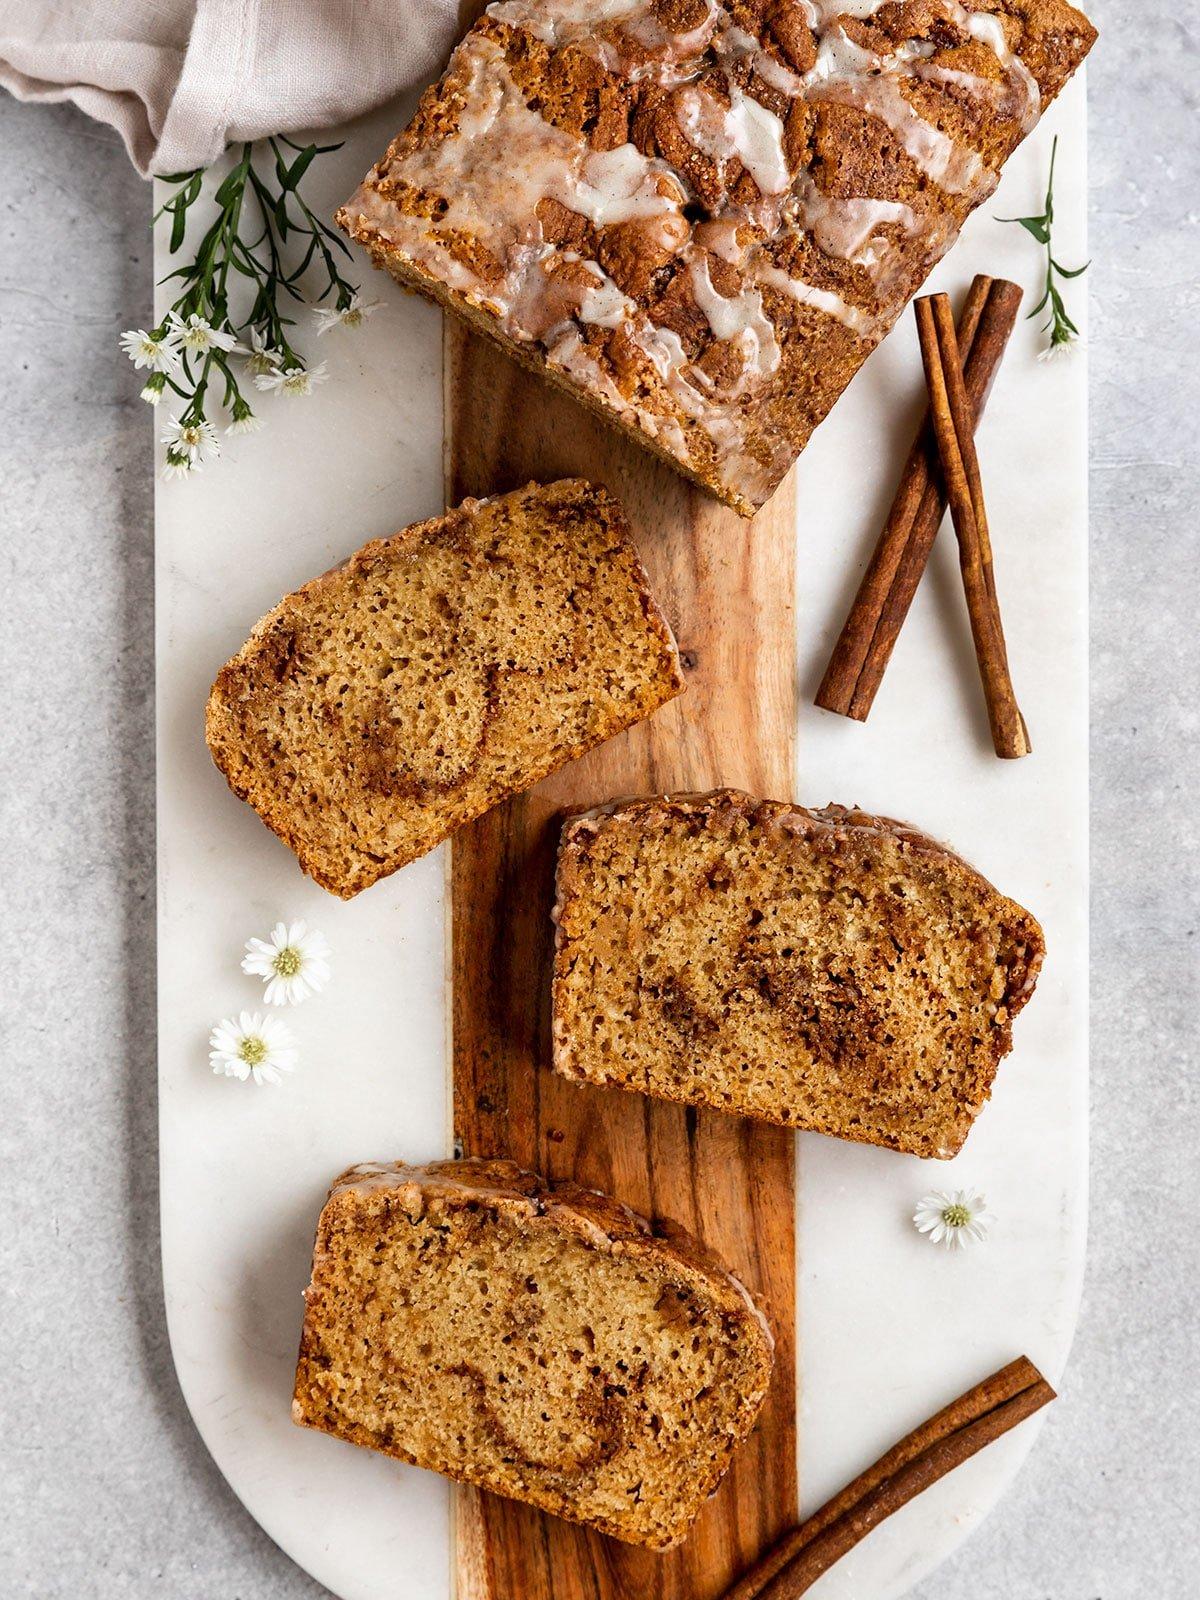 overhead shot of three slices of cinnamon bread with swirls of cinnamon sugar inside